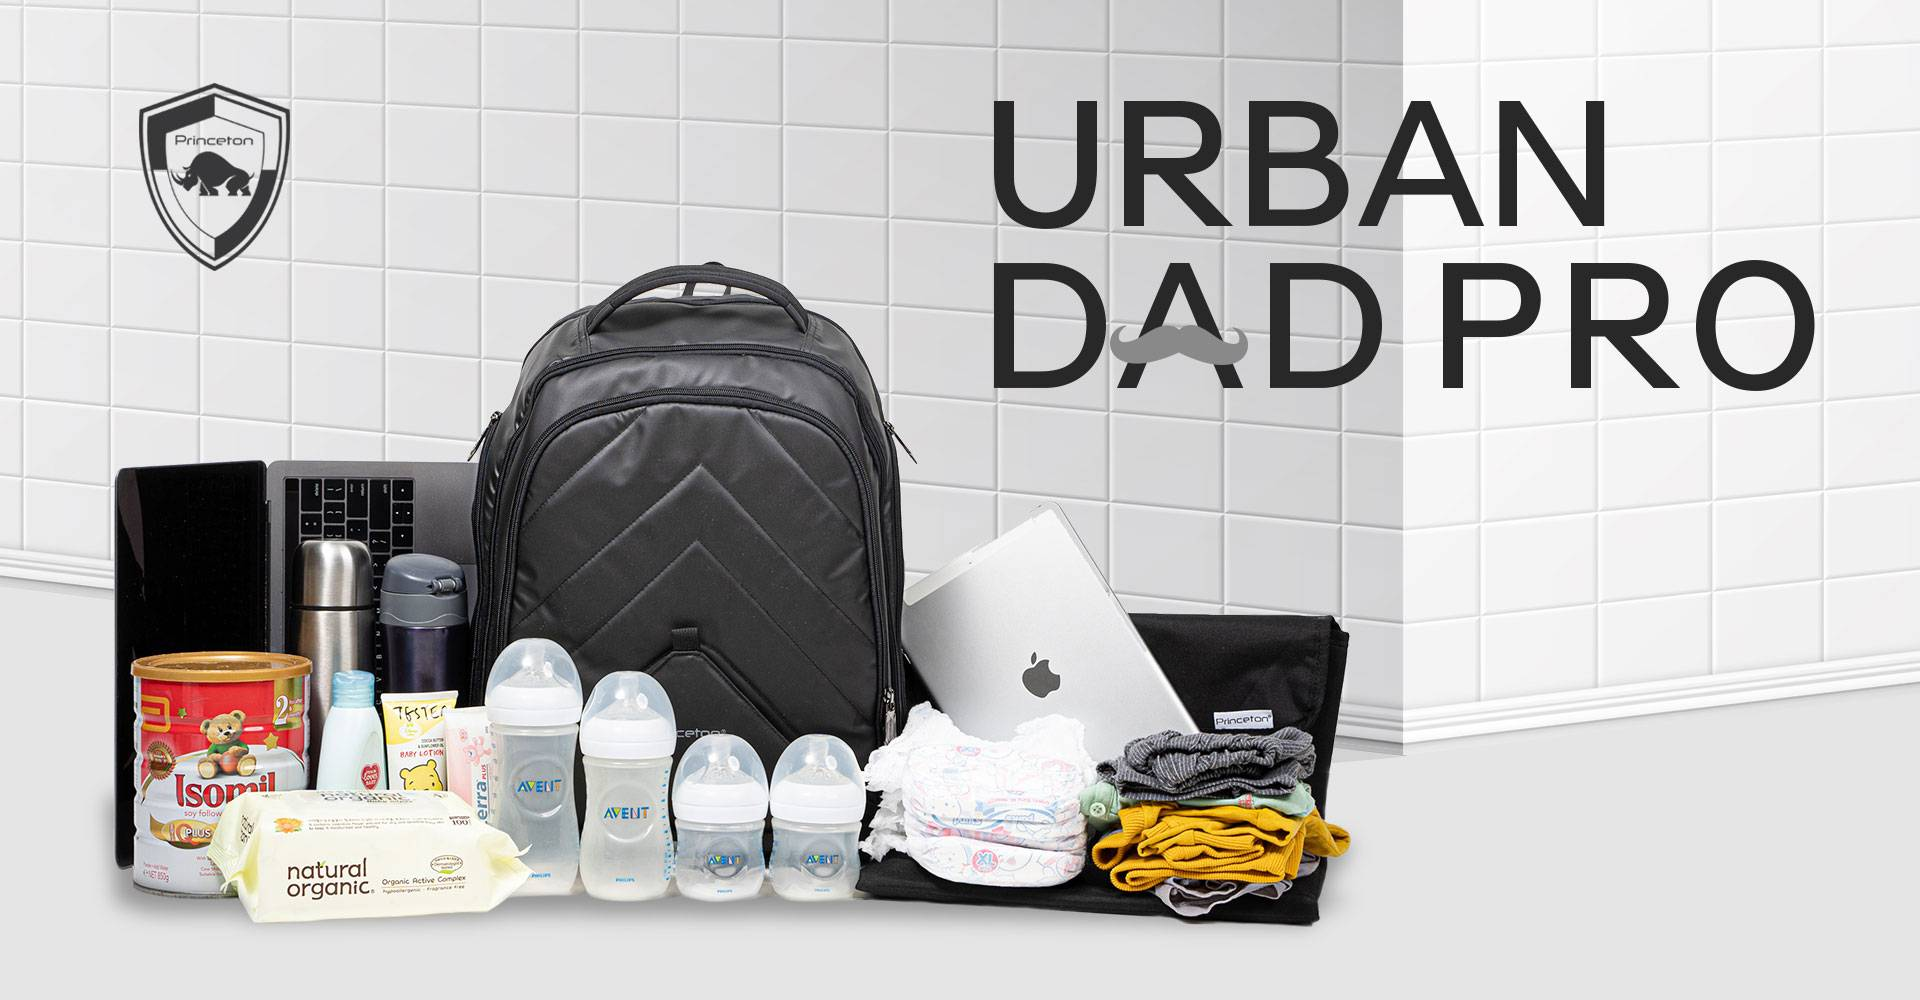 Urban Dad Pro